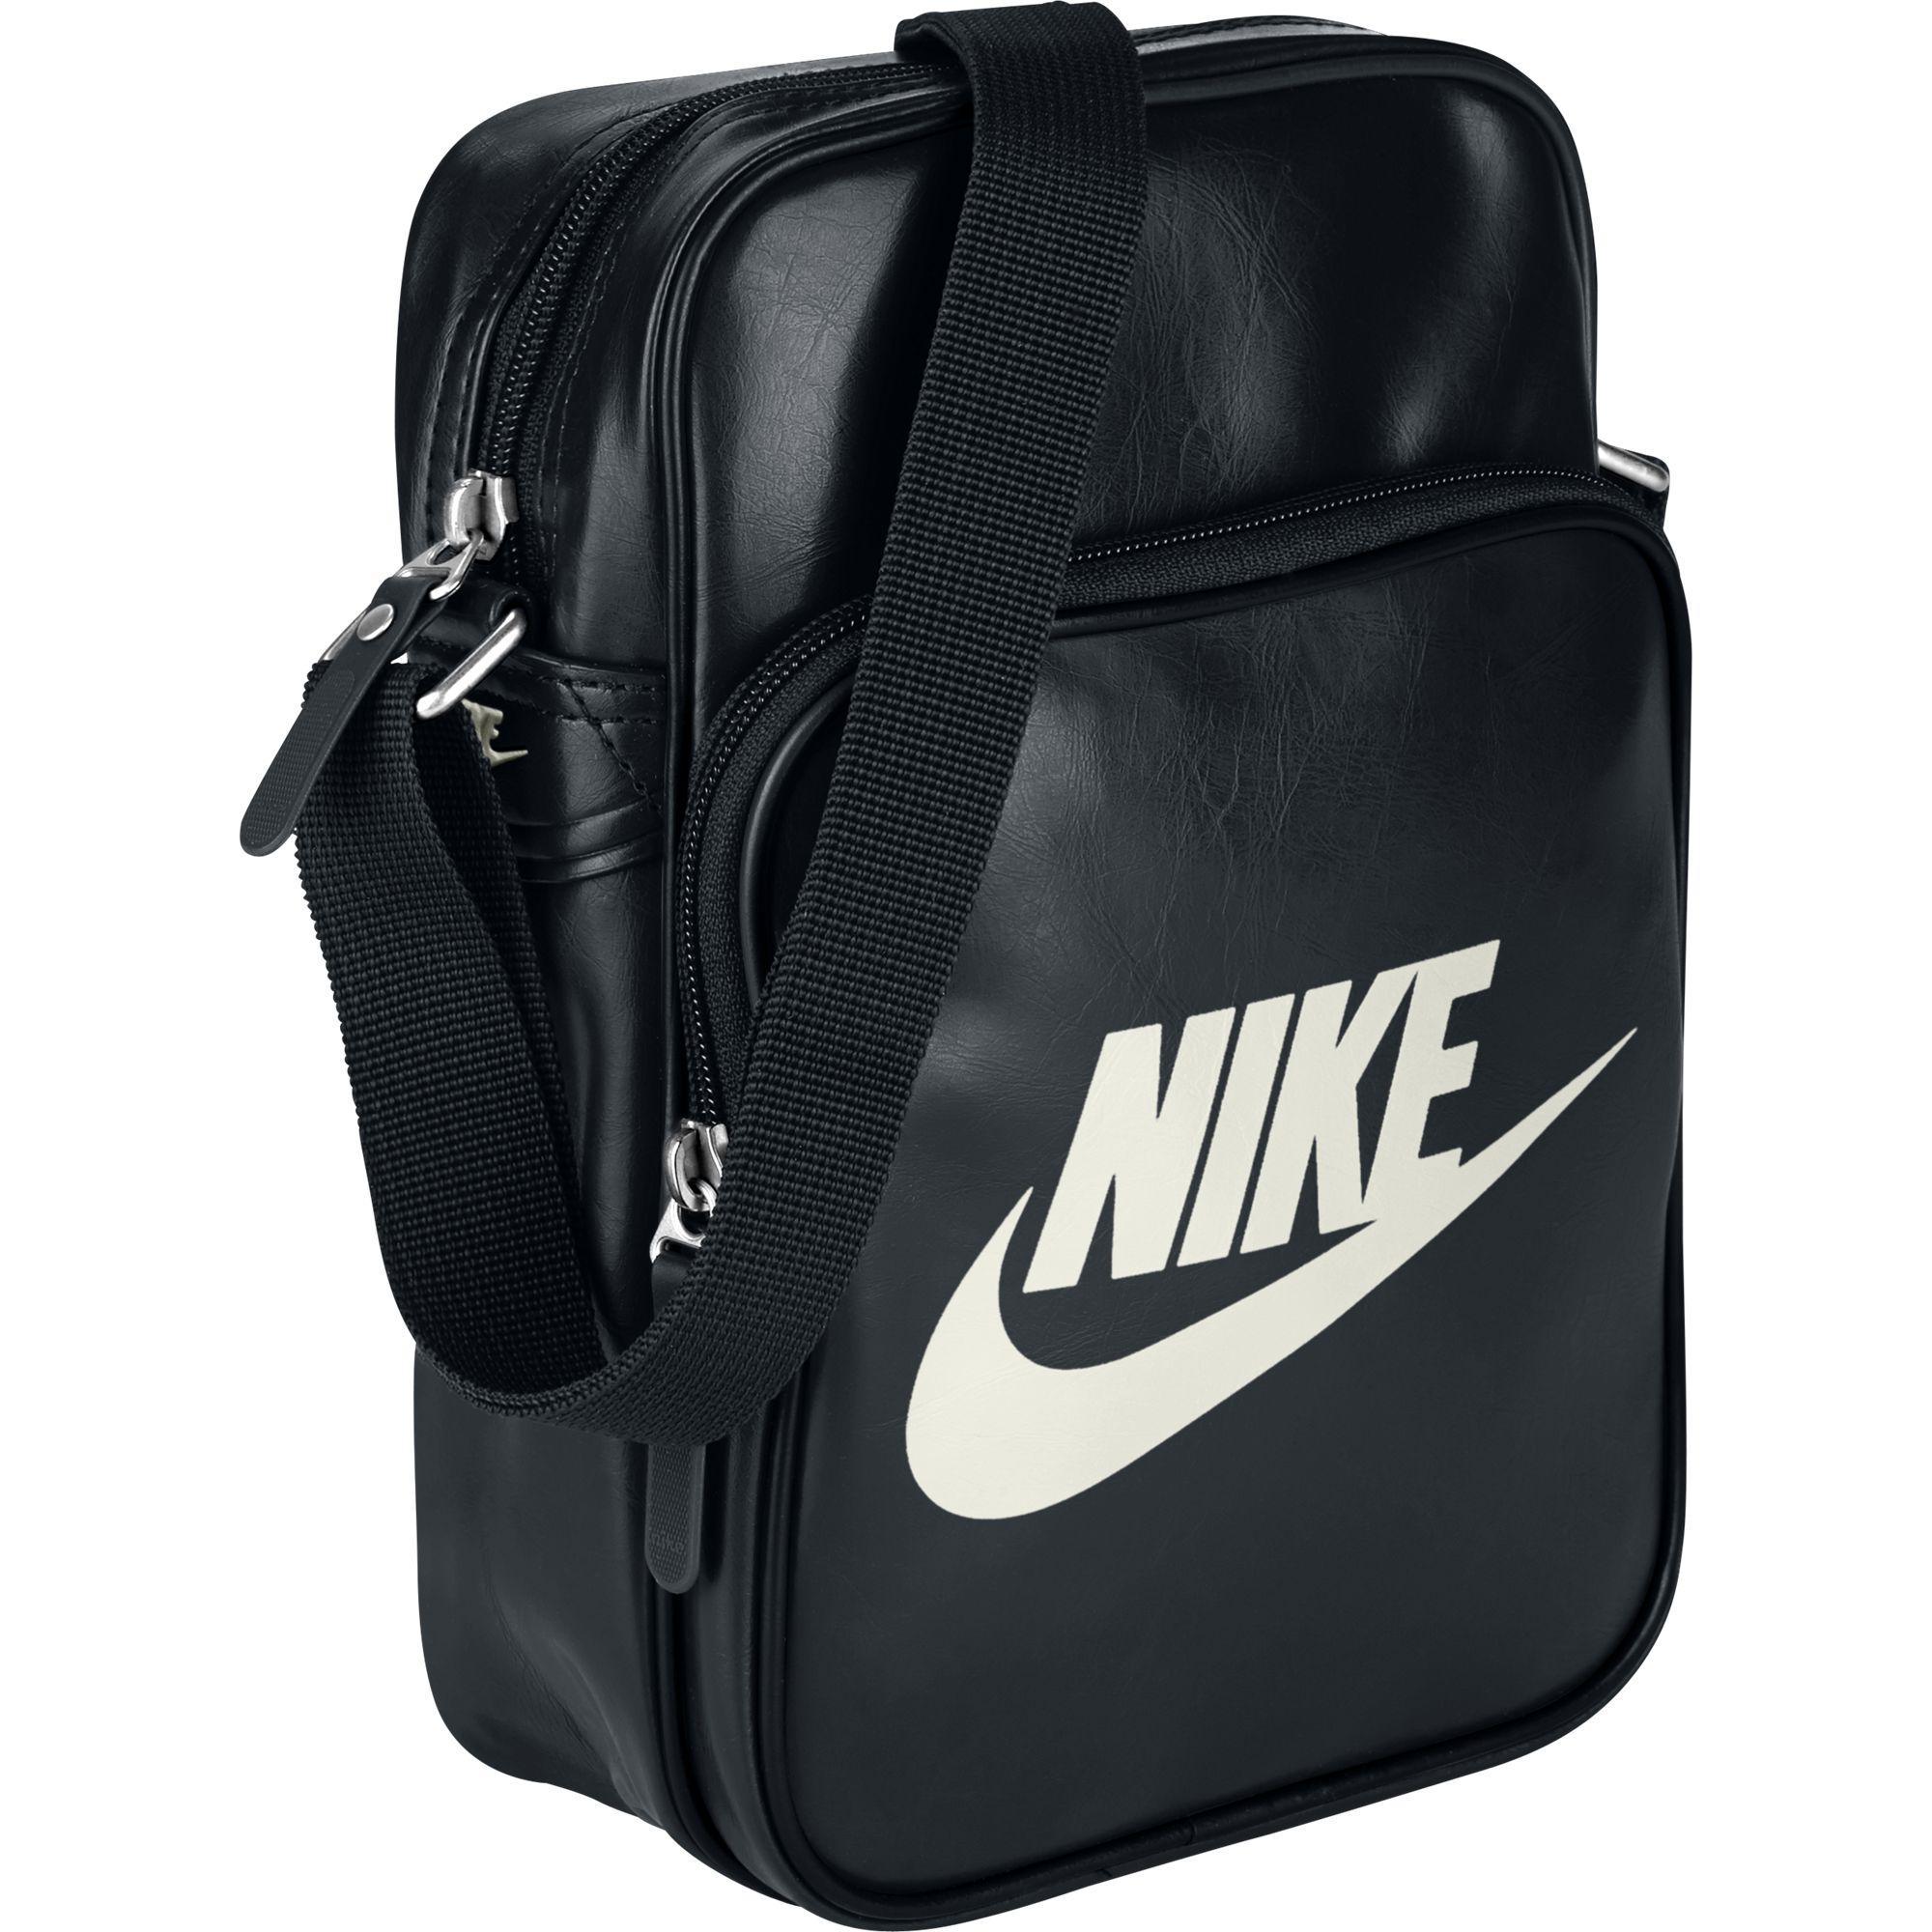 7d1c2646a3b3 Nike Sb Heritage Bag Camo Nike Sb Heritage Shoulder Bag